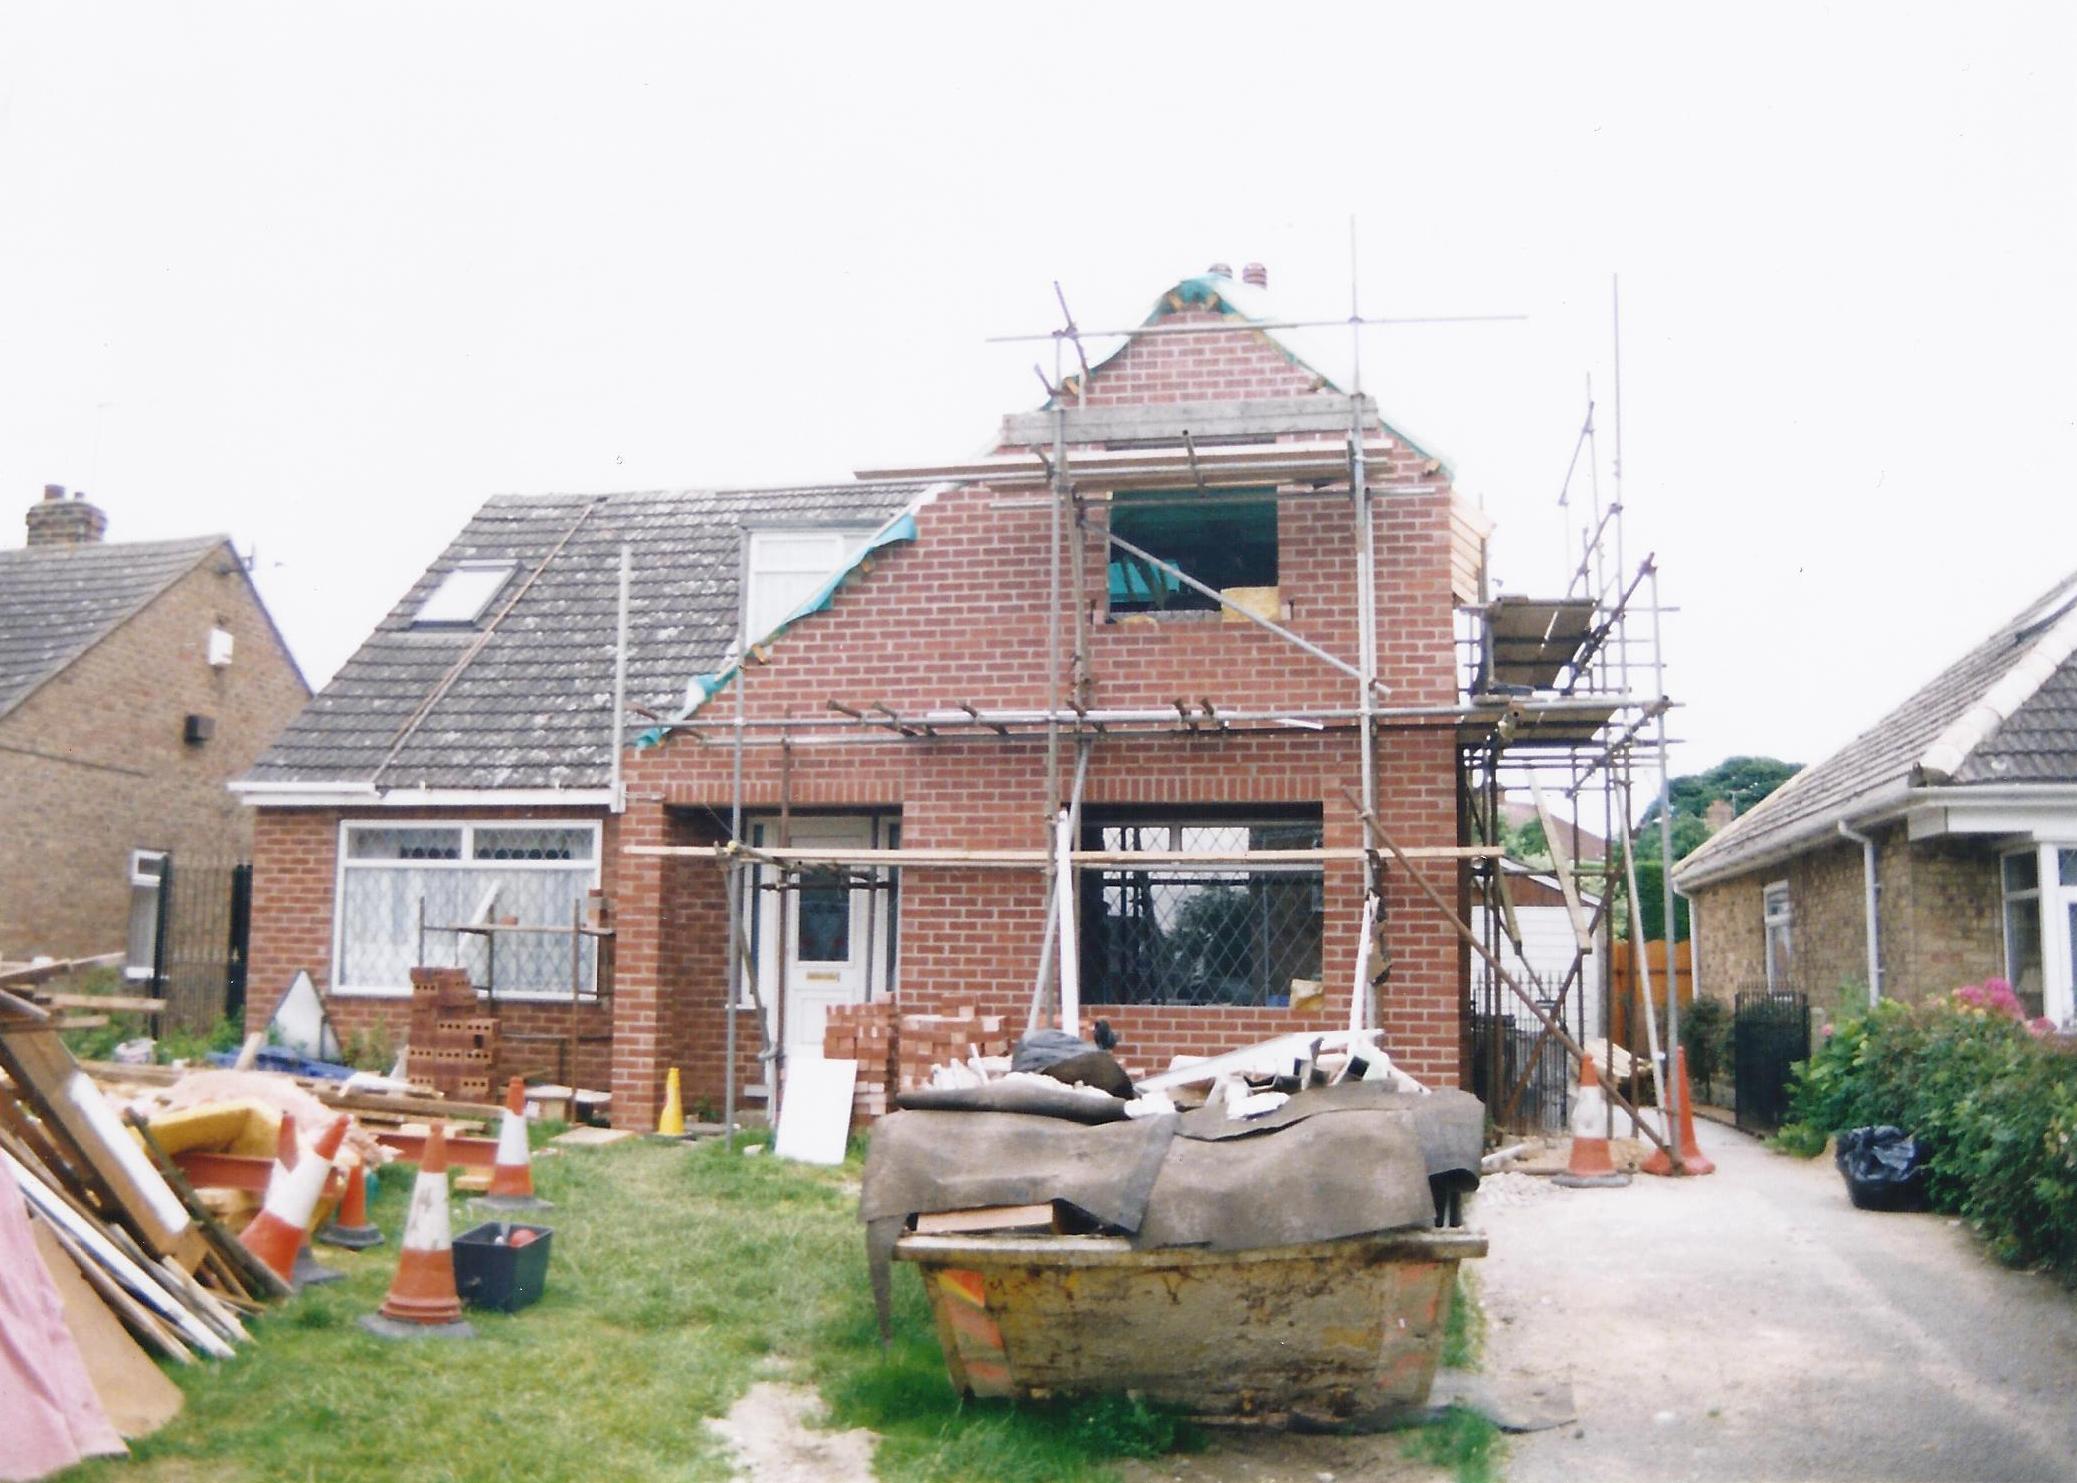 Construction 4 - Sproatley Cottage - East Yorkshire Architects - Samuel Kendall Associates.jpg.jpg